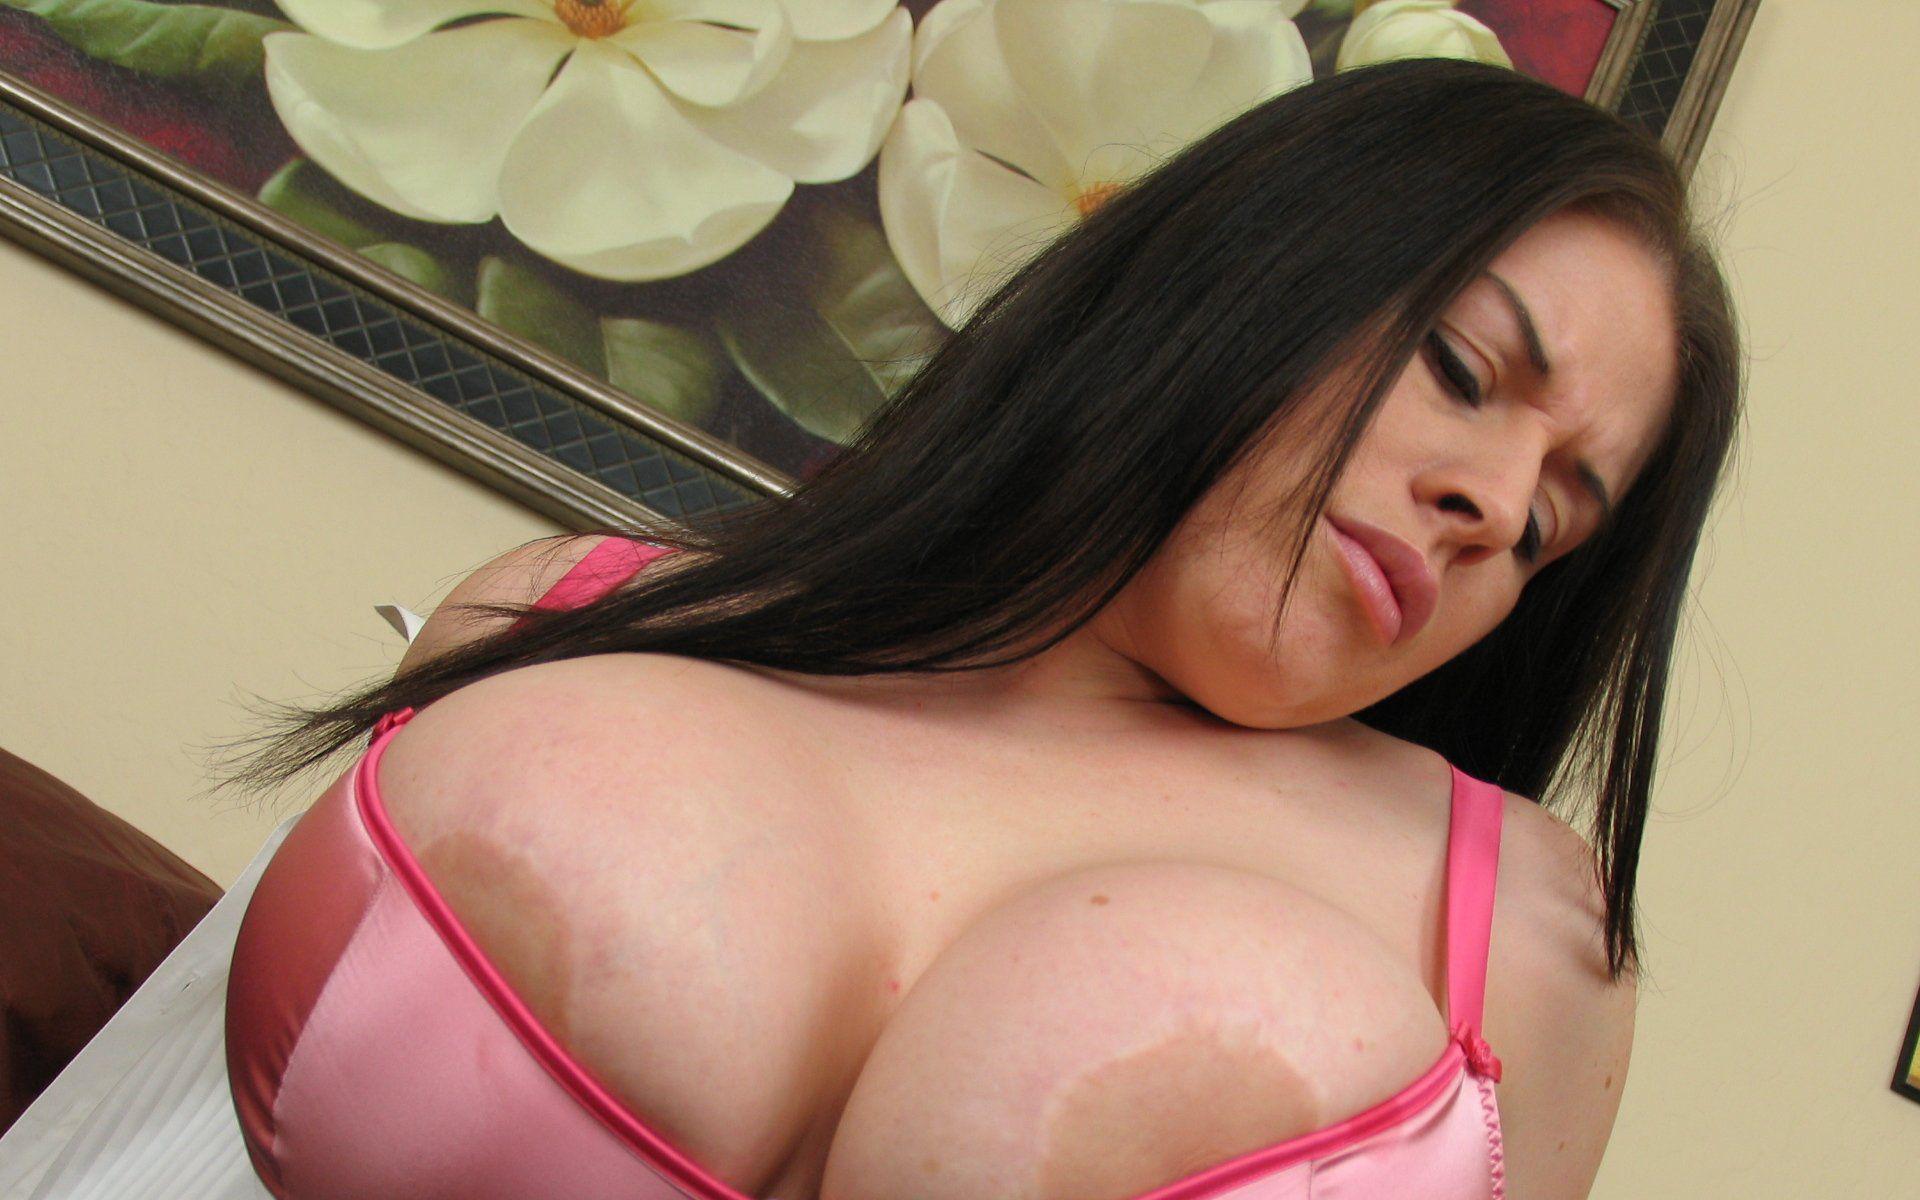 Free boob pic galleries